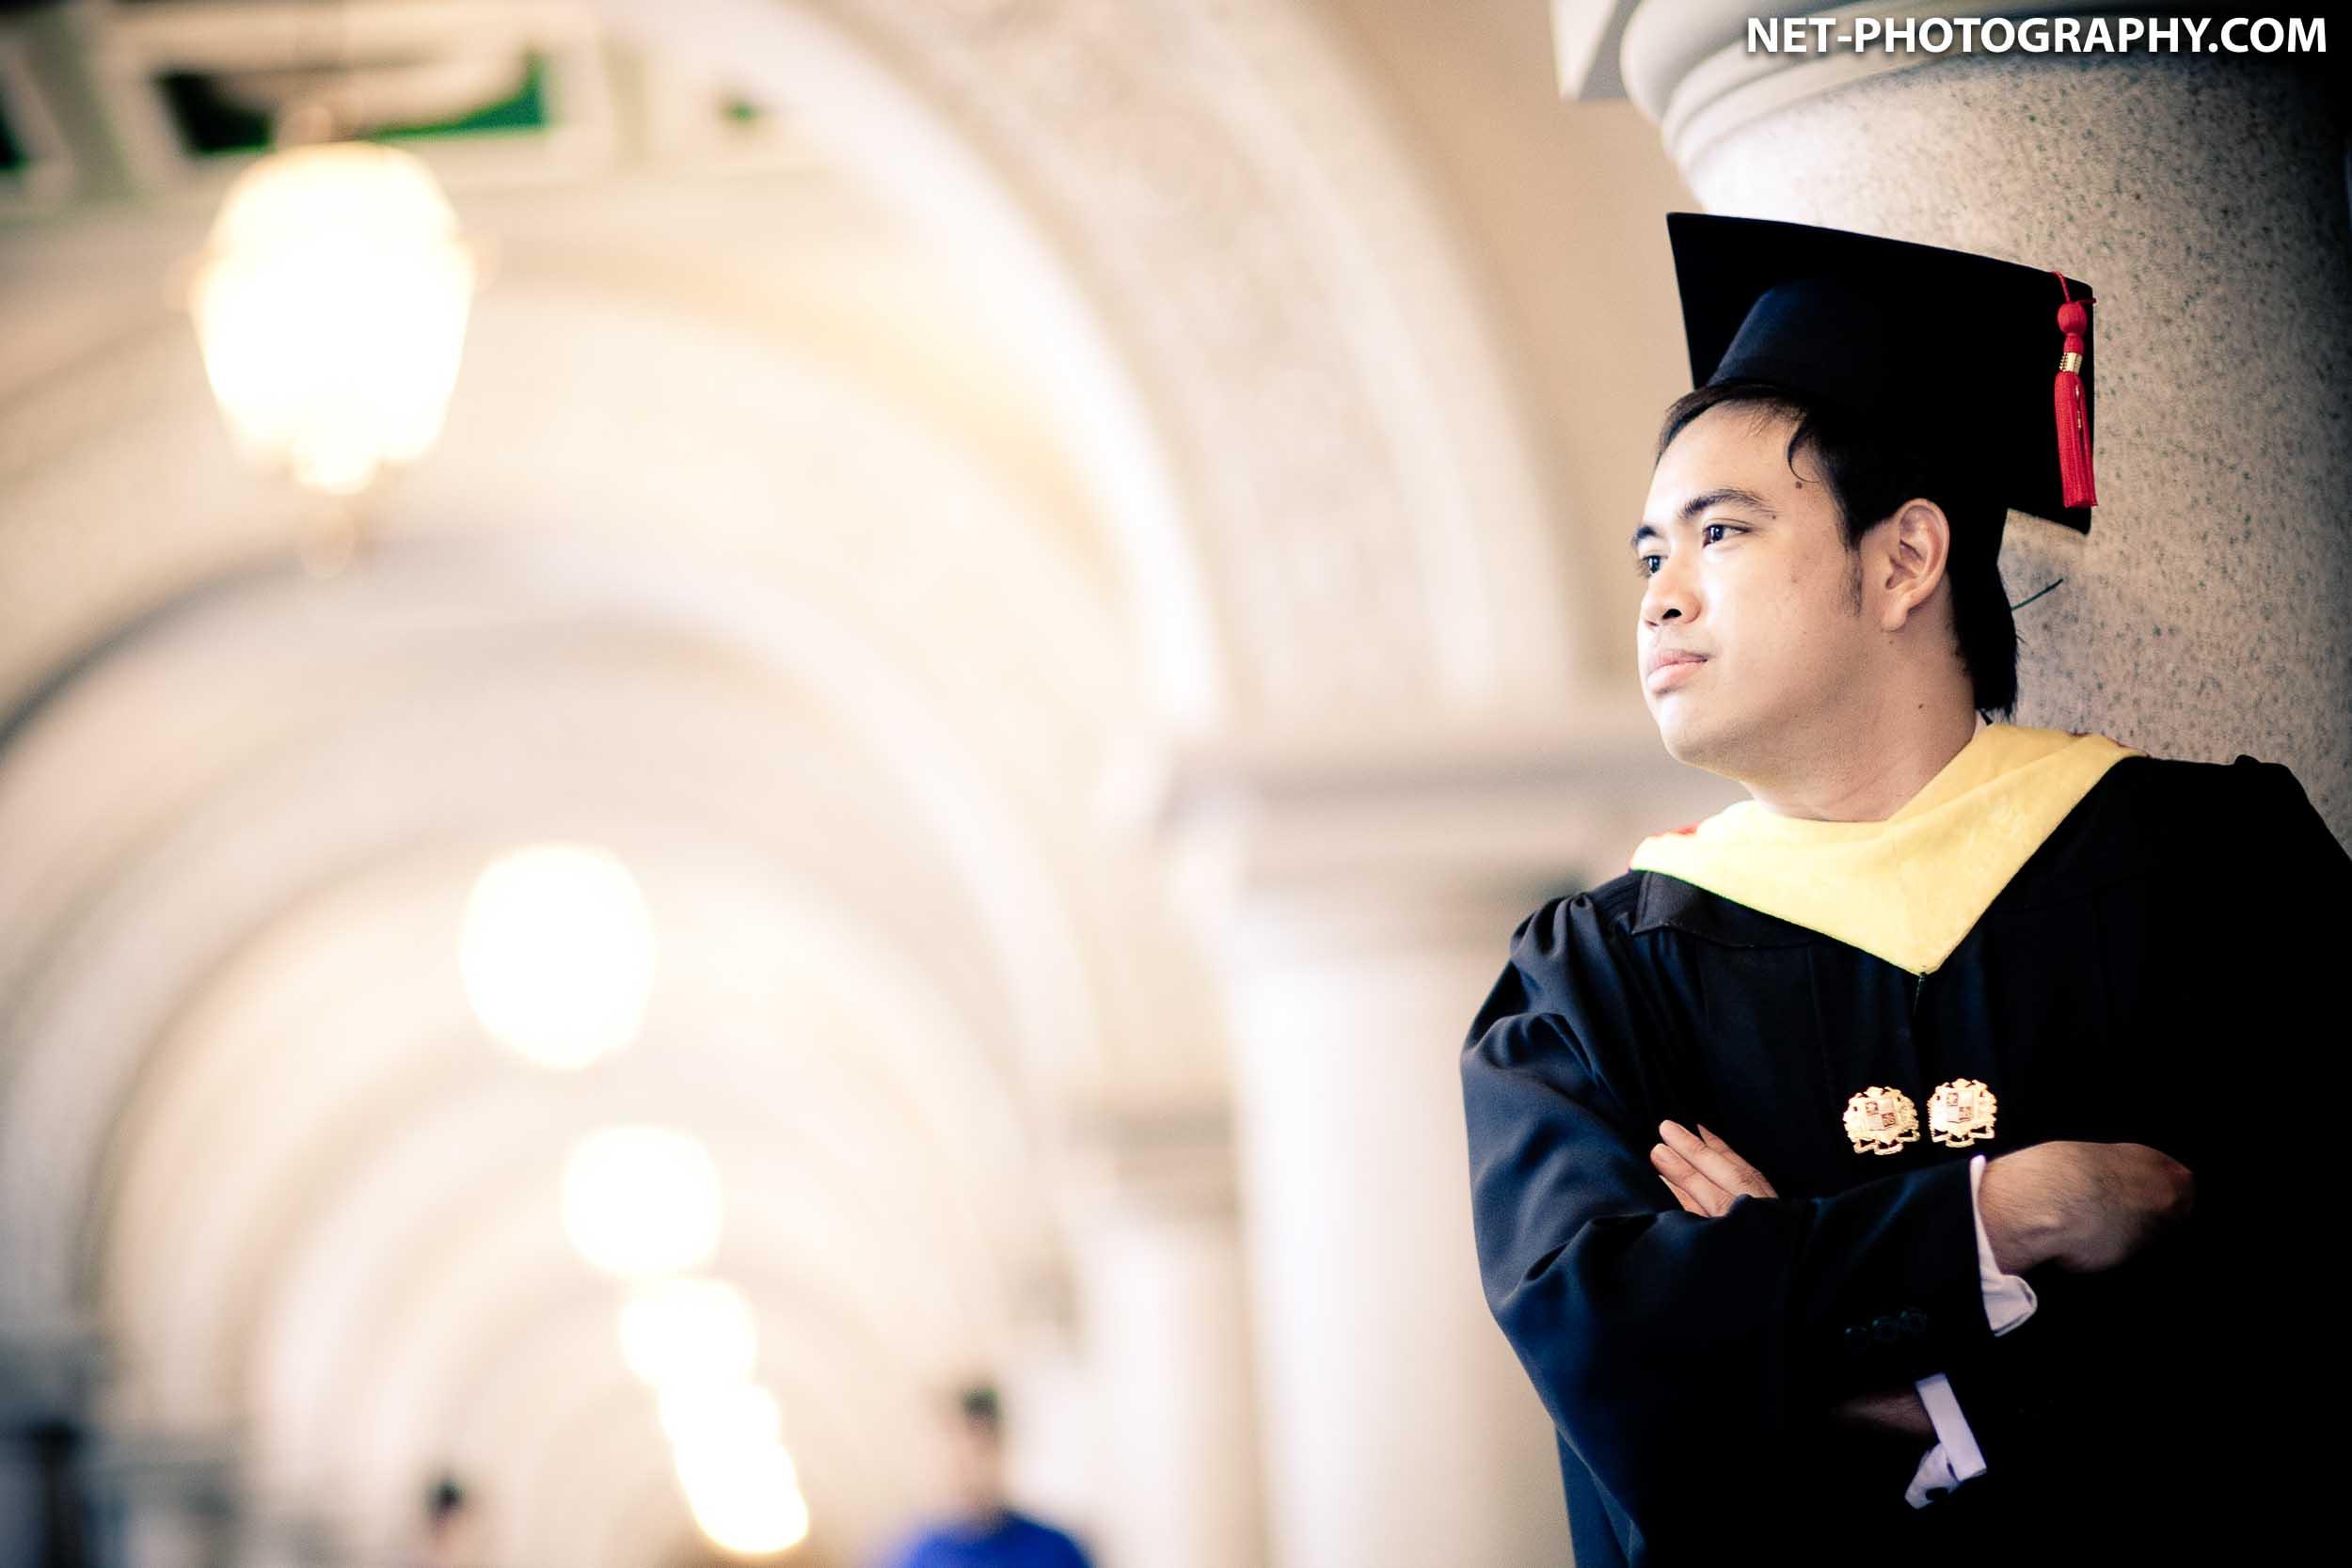 Assumption University Graduation 2010